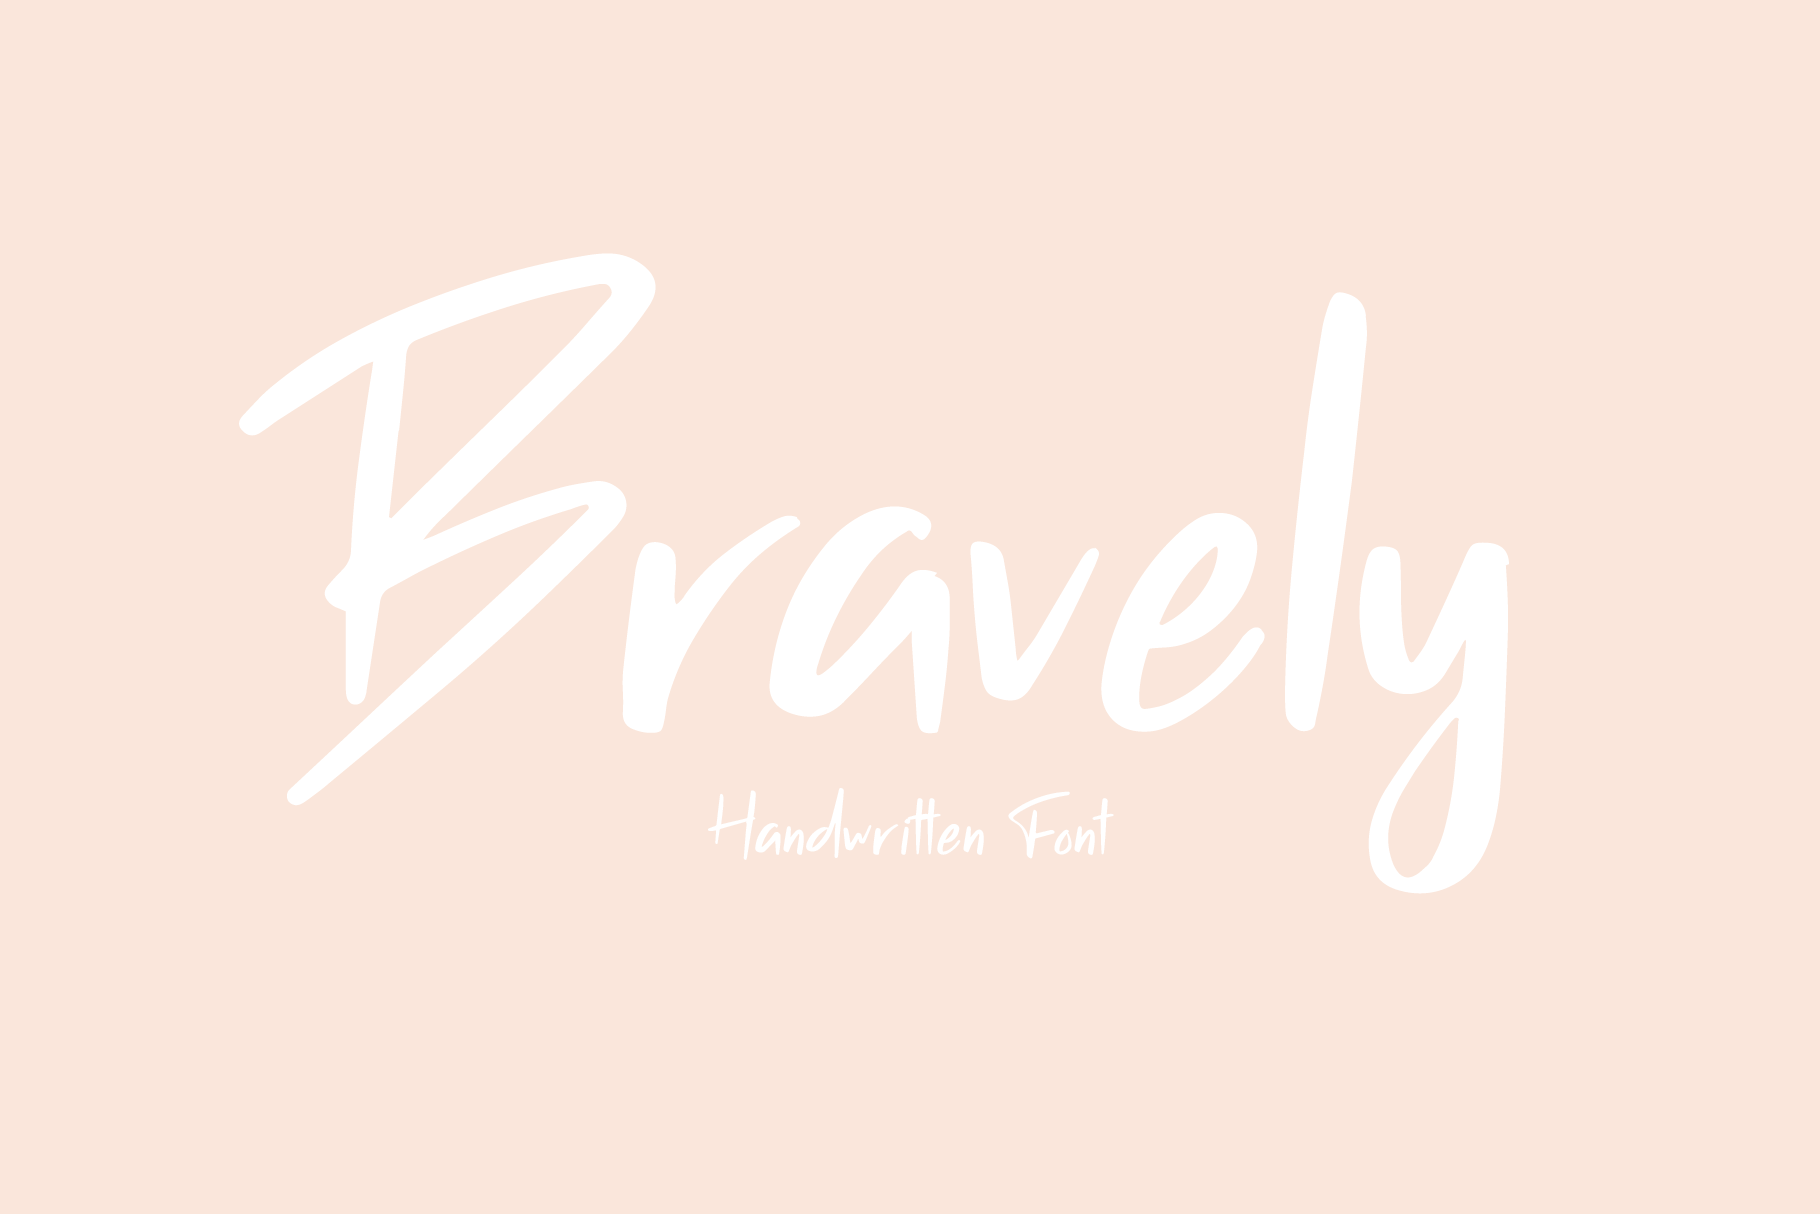 Bravely - Handwritten Font example image 11